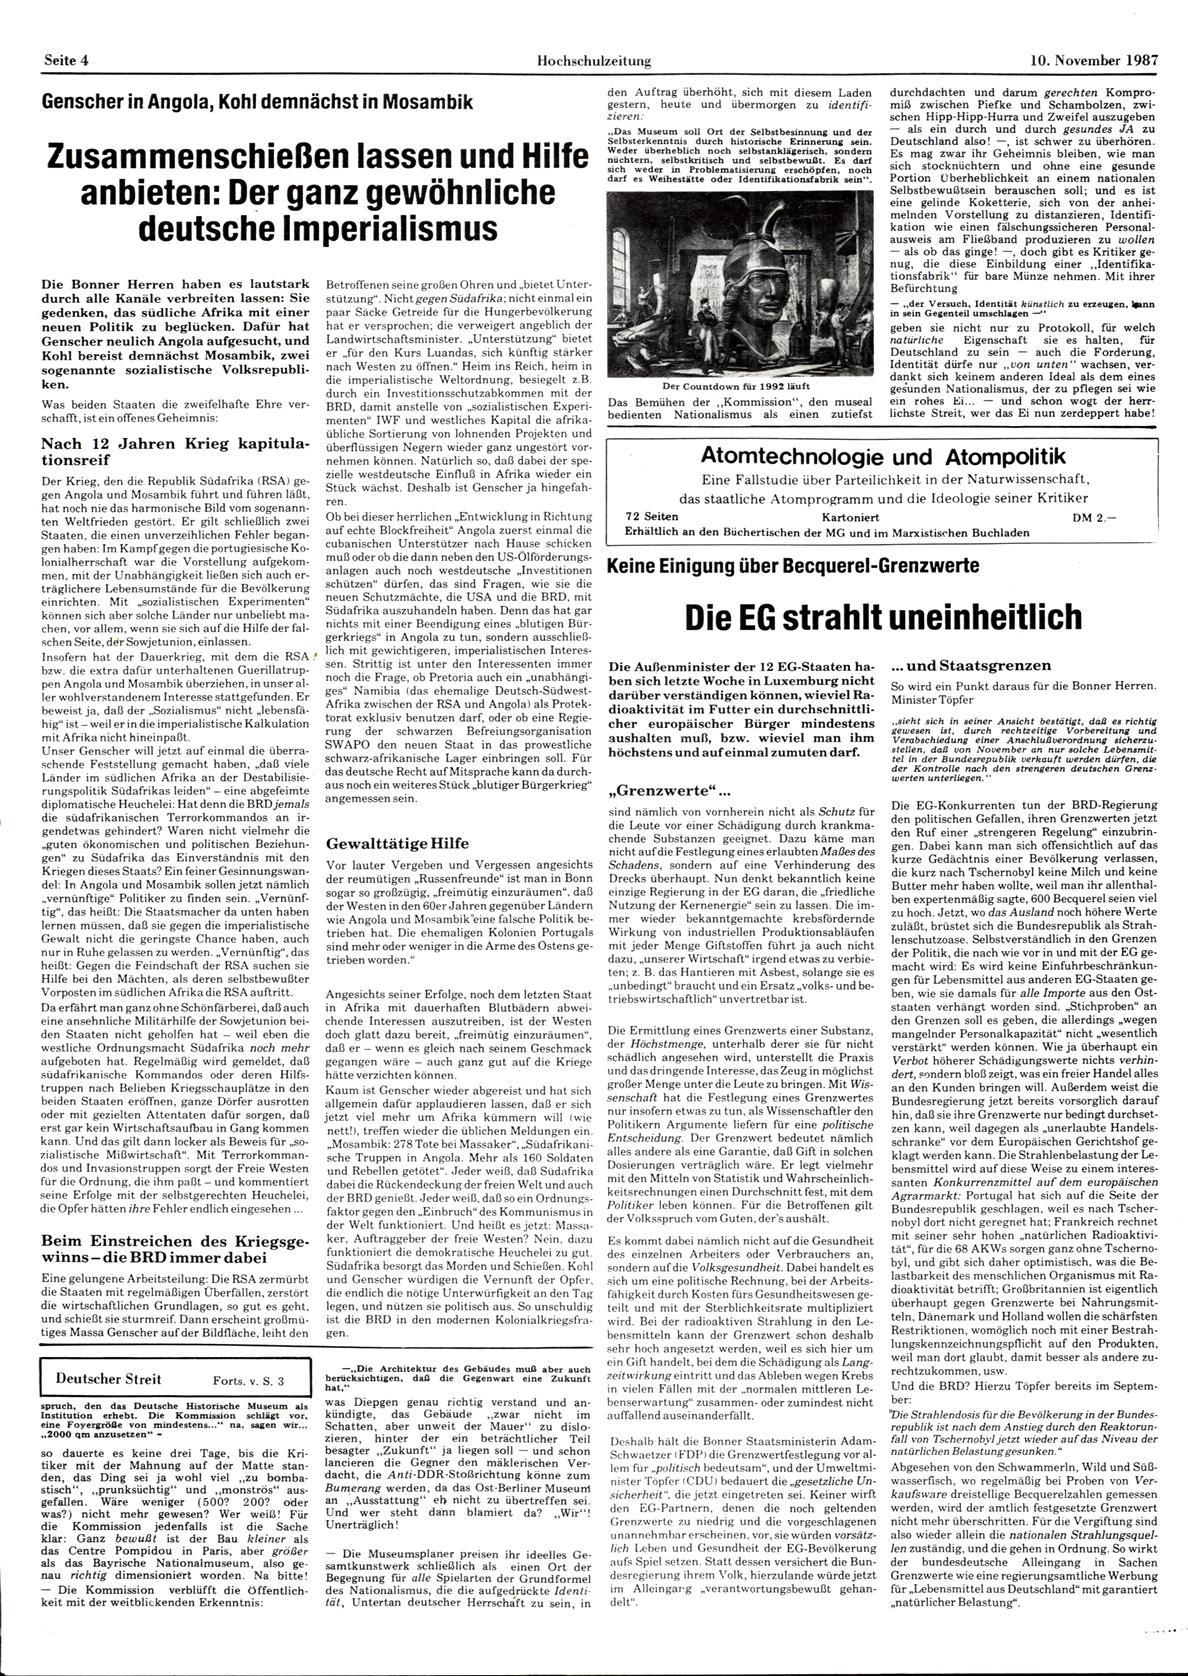 Bochum_BHZ_19871110_158_004